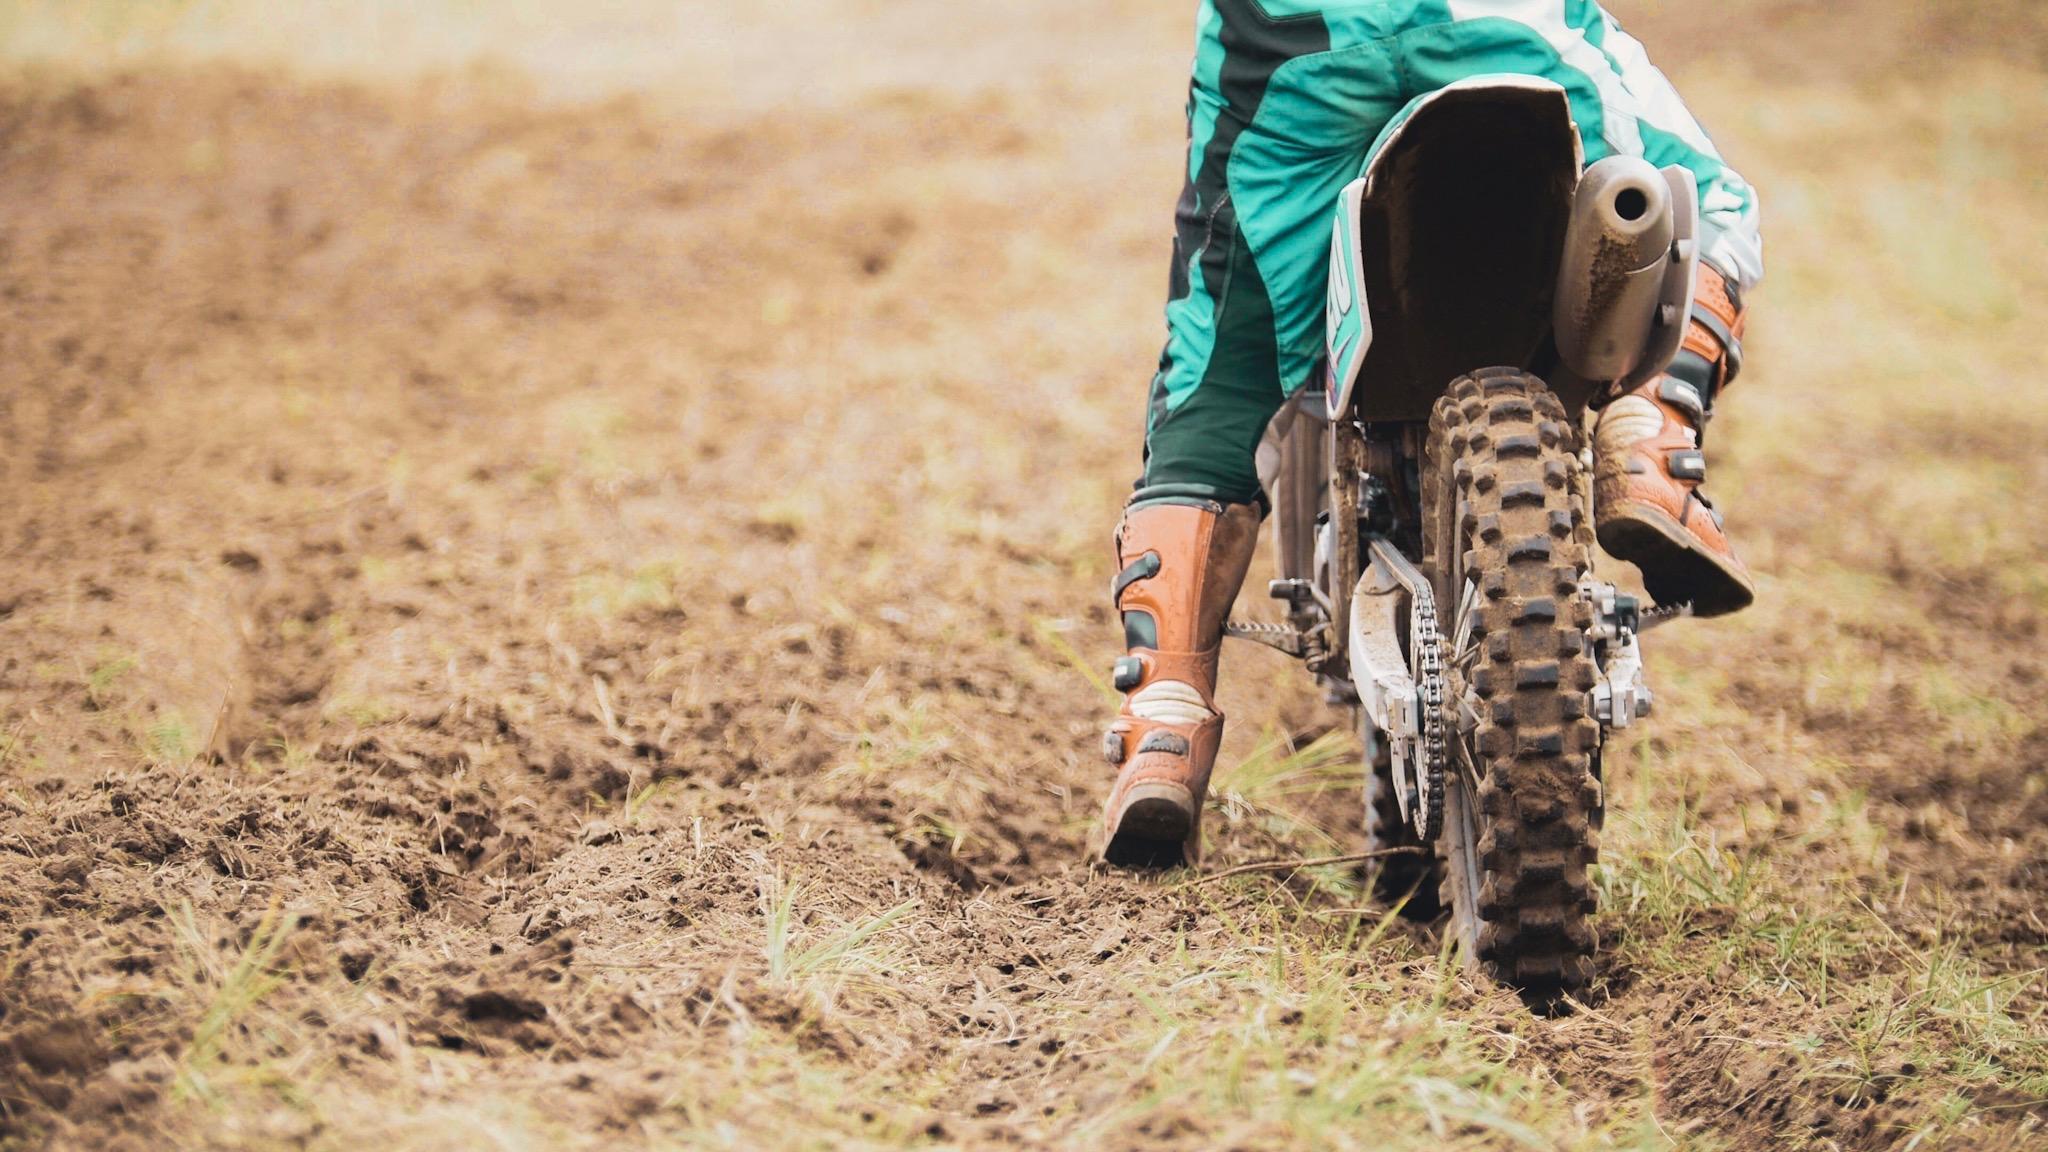 - Riding Dirt Bikes